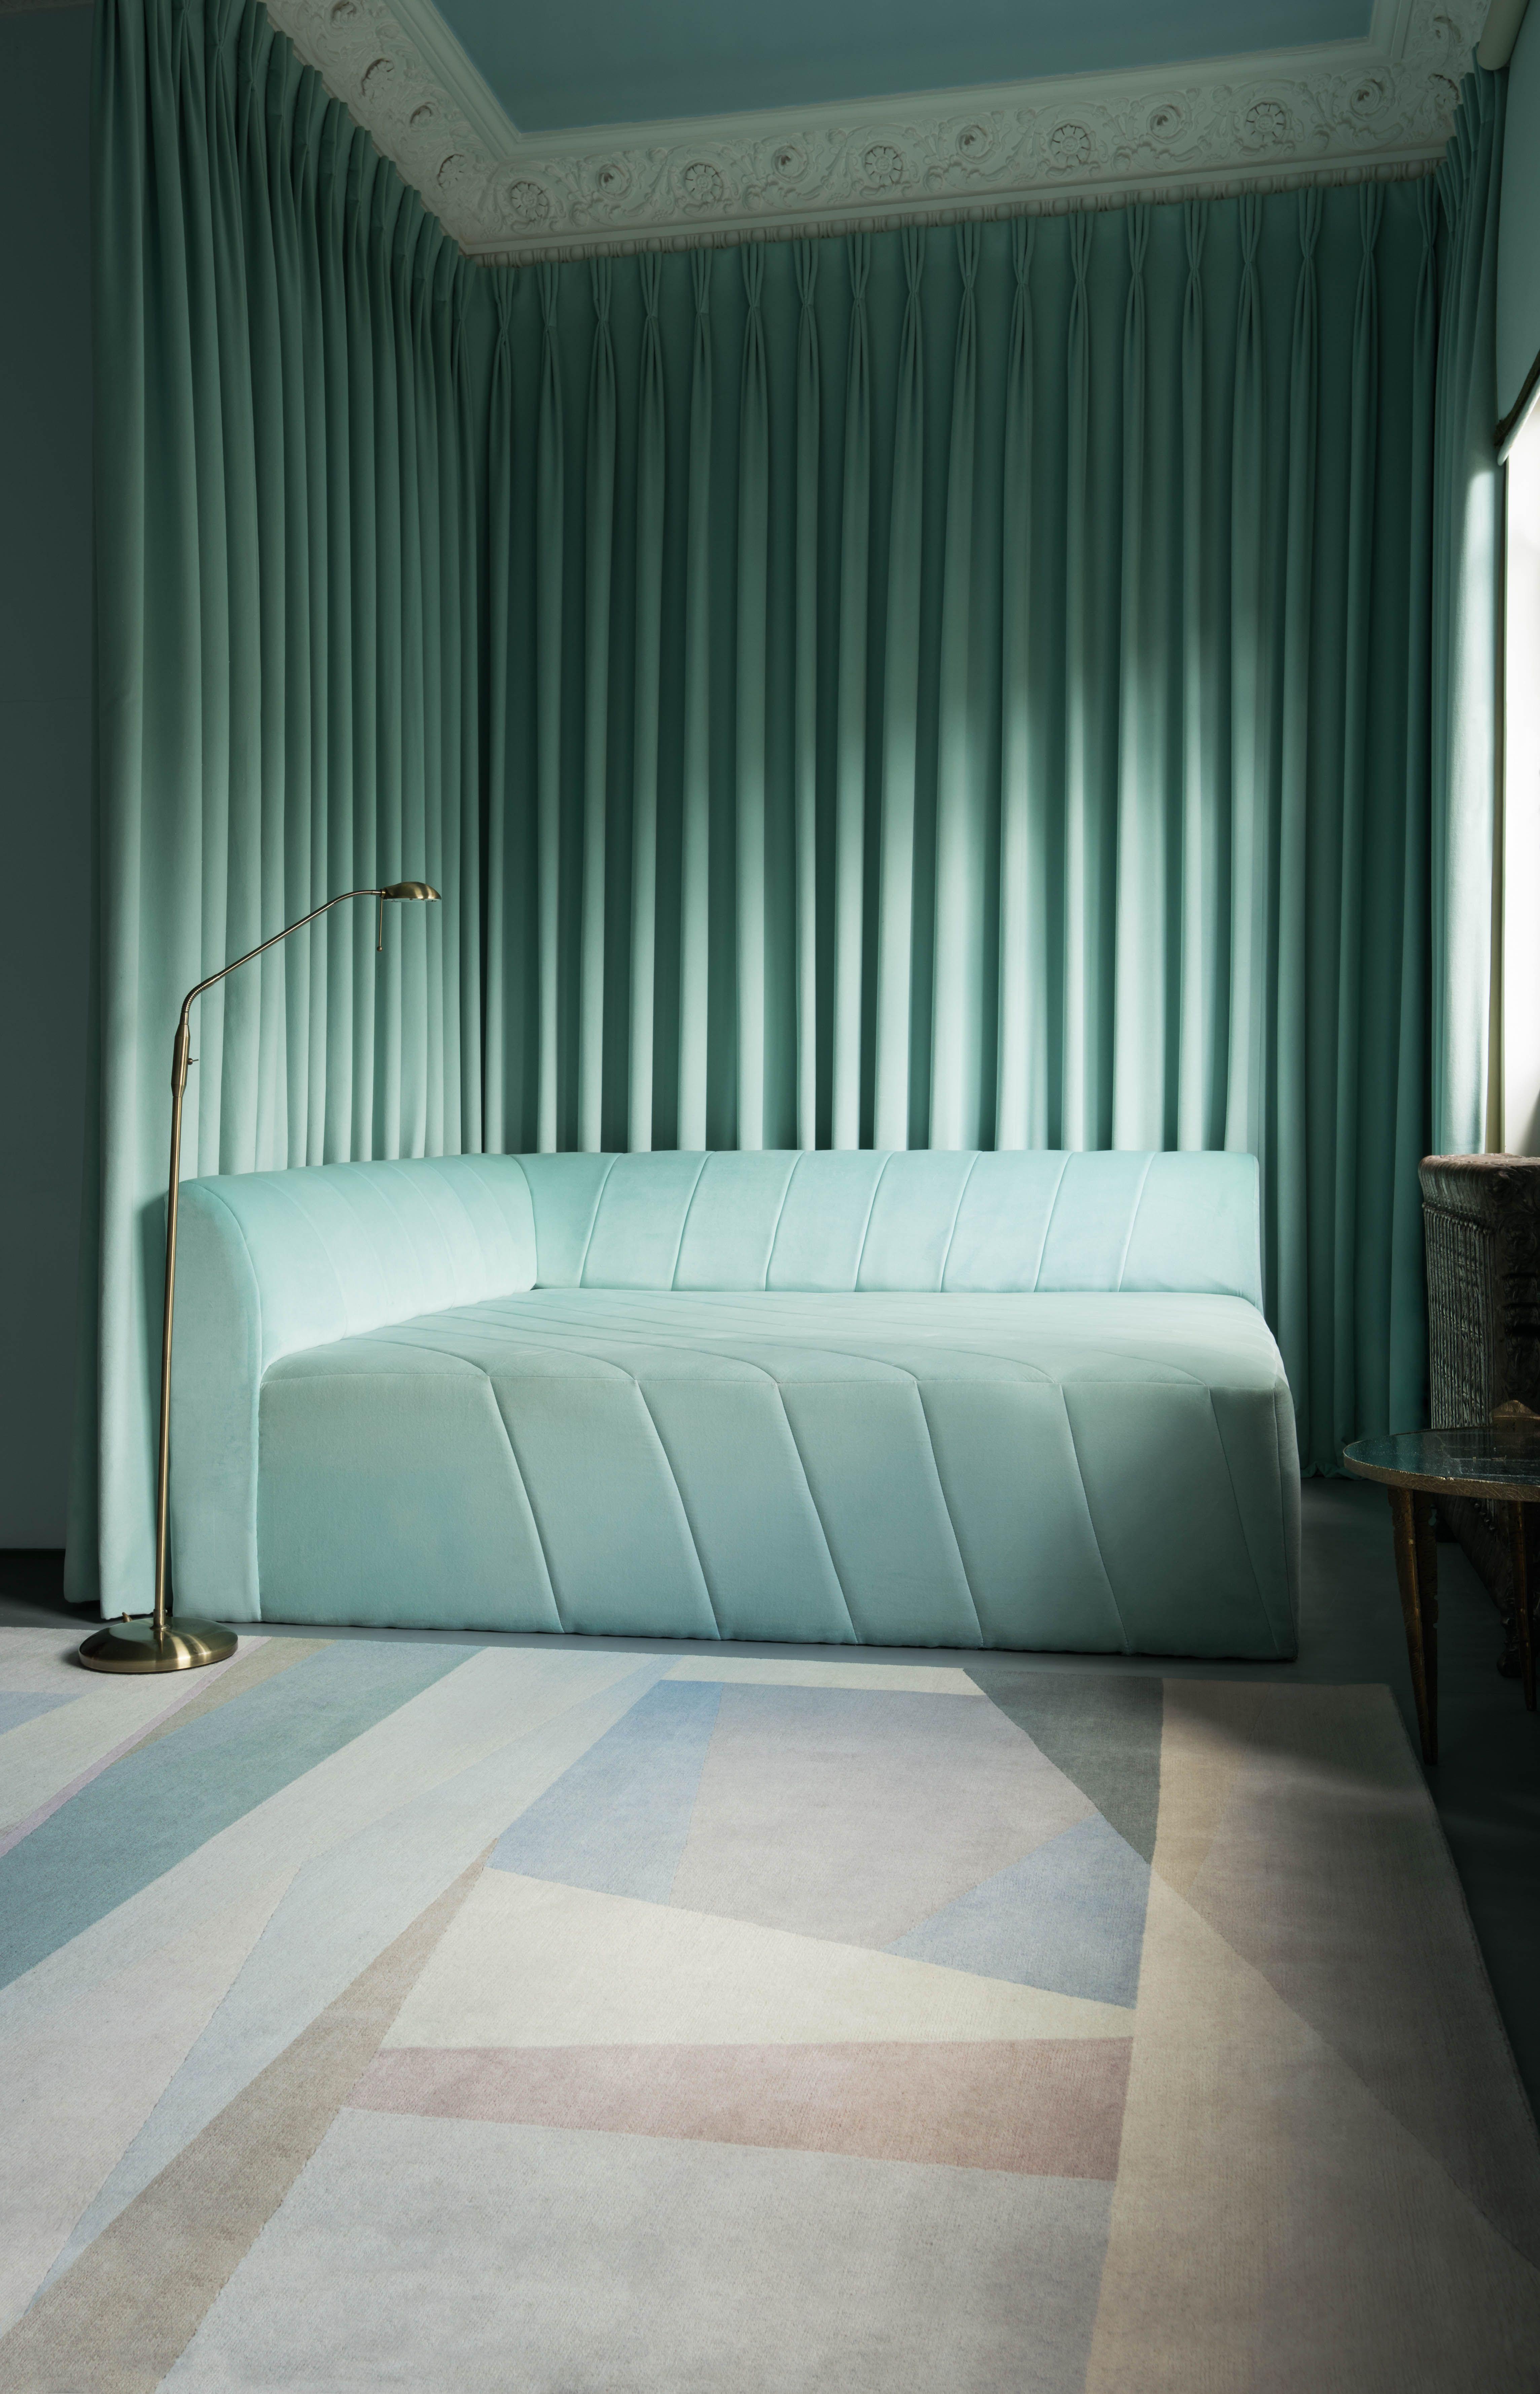 Paul smith x the rug company split light rug home - Interior design lighting companies ...